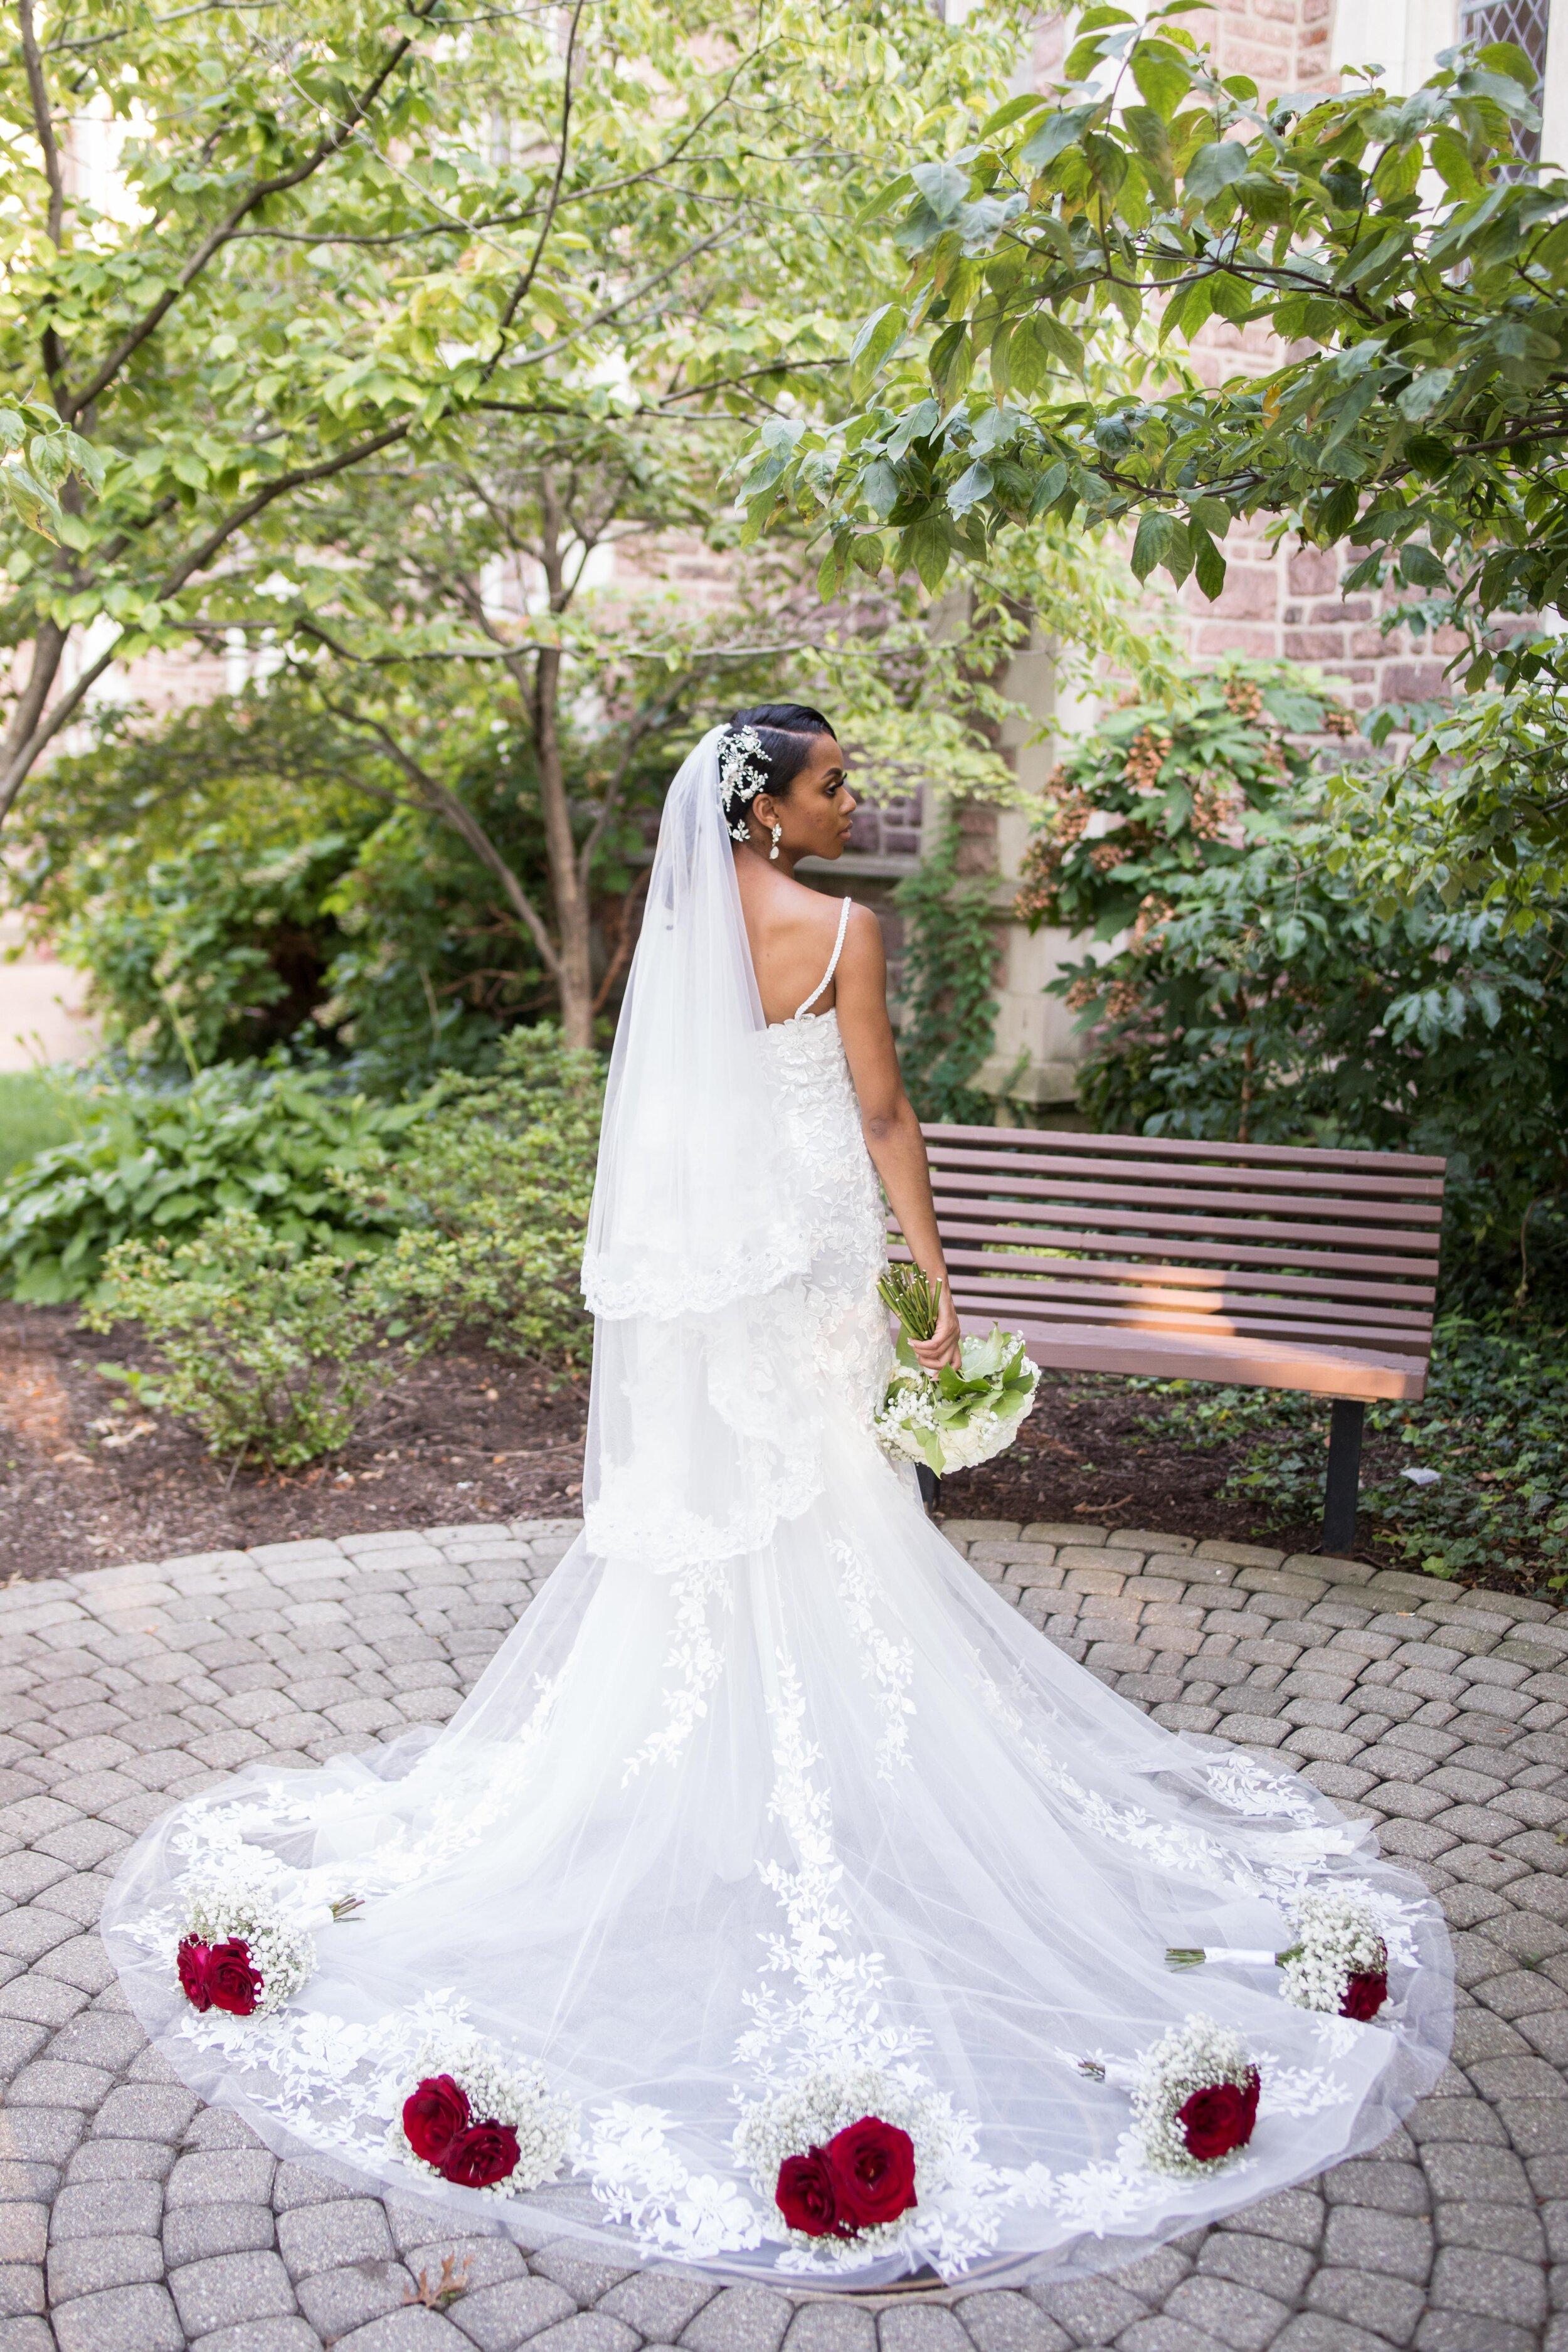 8_3_2019_BONTY_WEDDING-553.jpg